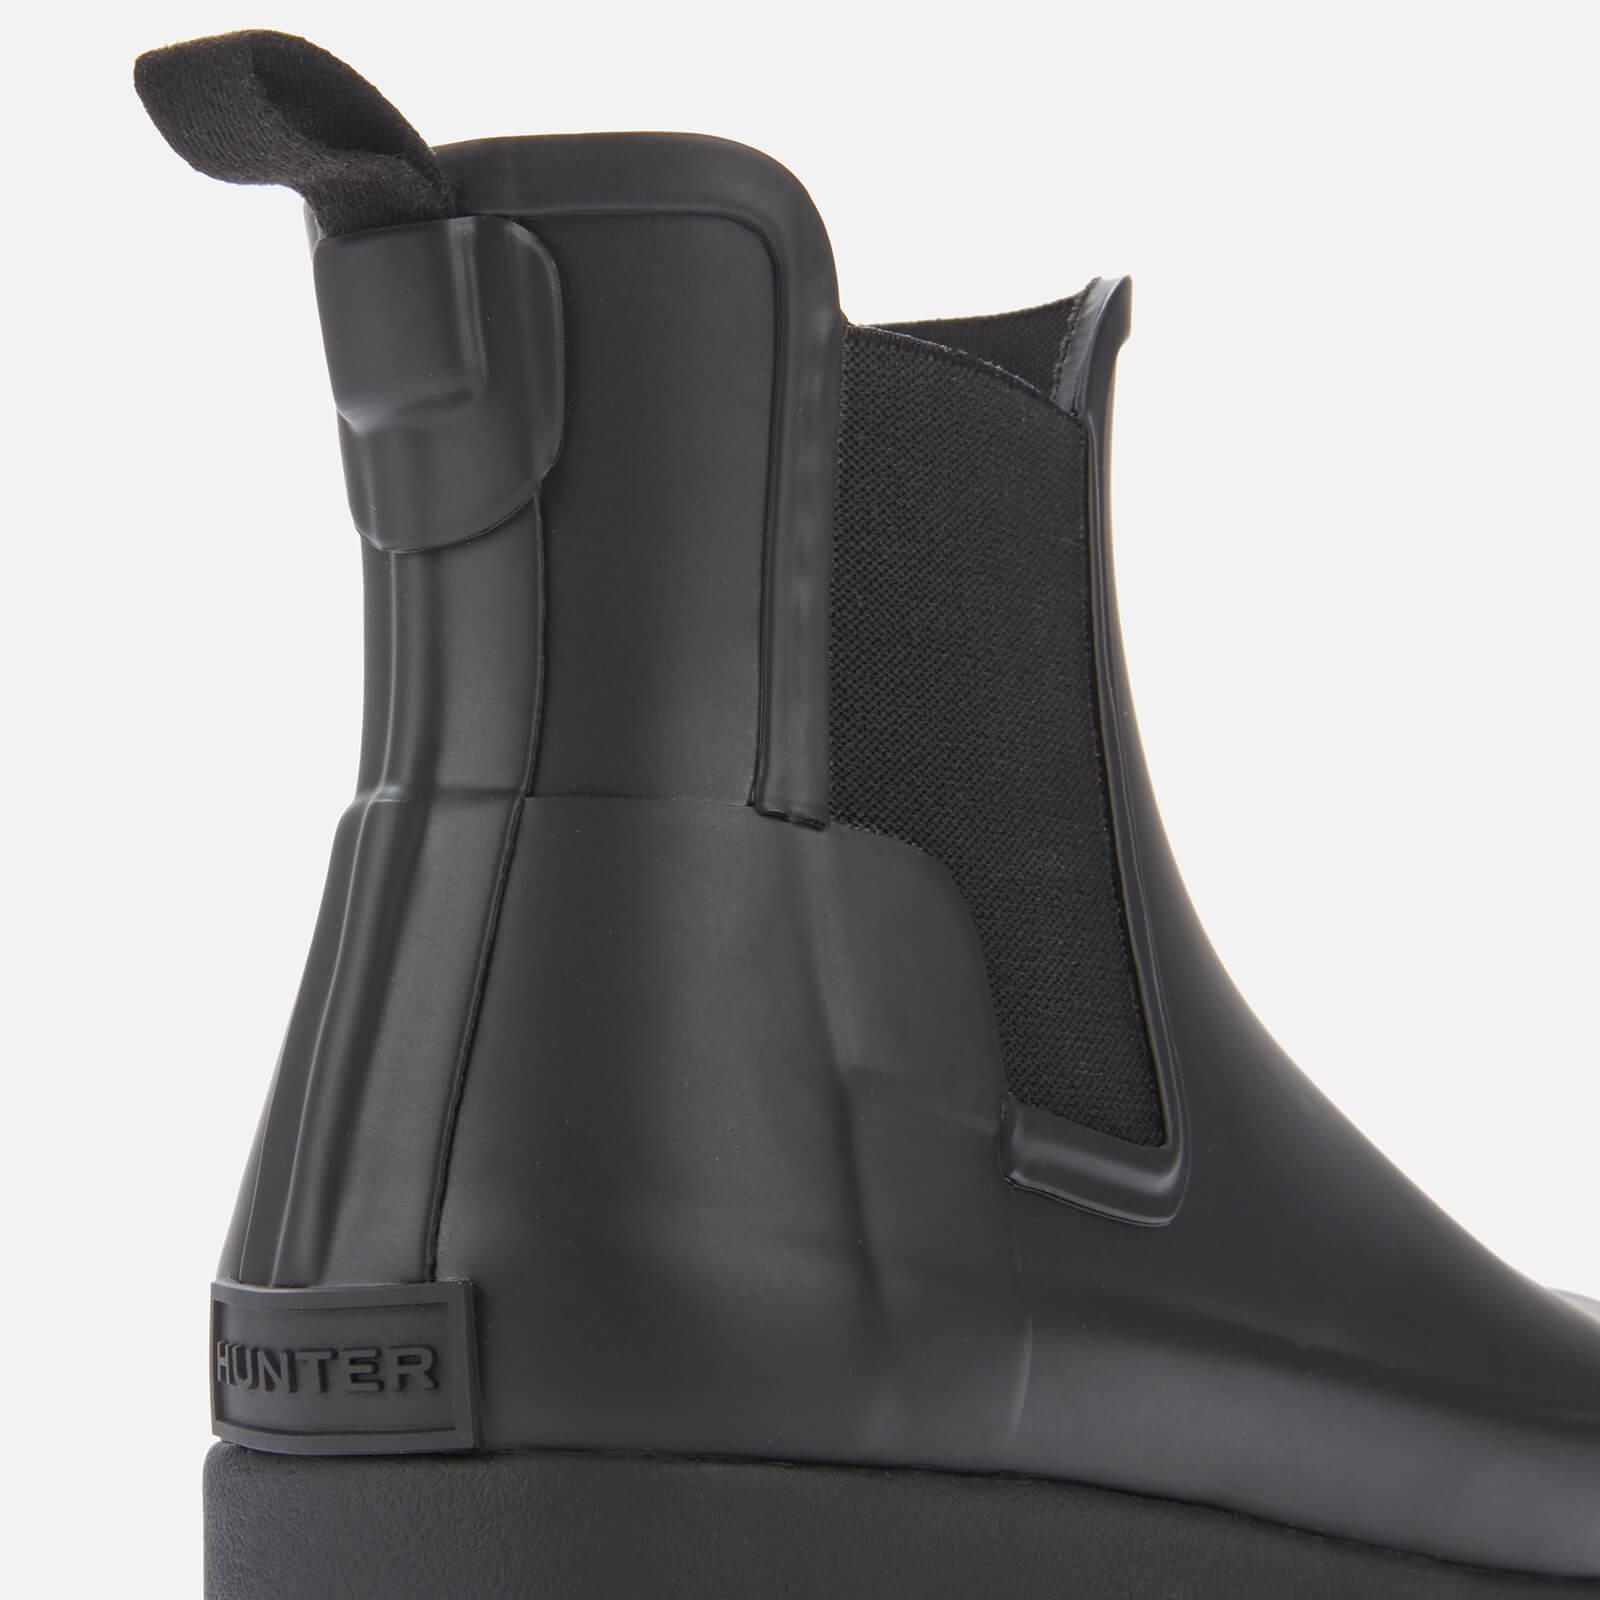 HUNTER Rubber Women's Original Refined Chelsea Boots in Black